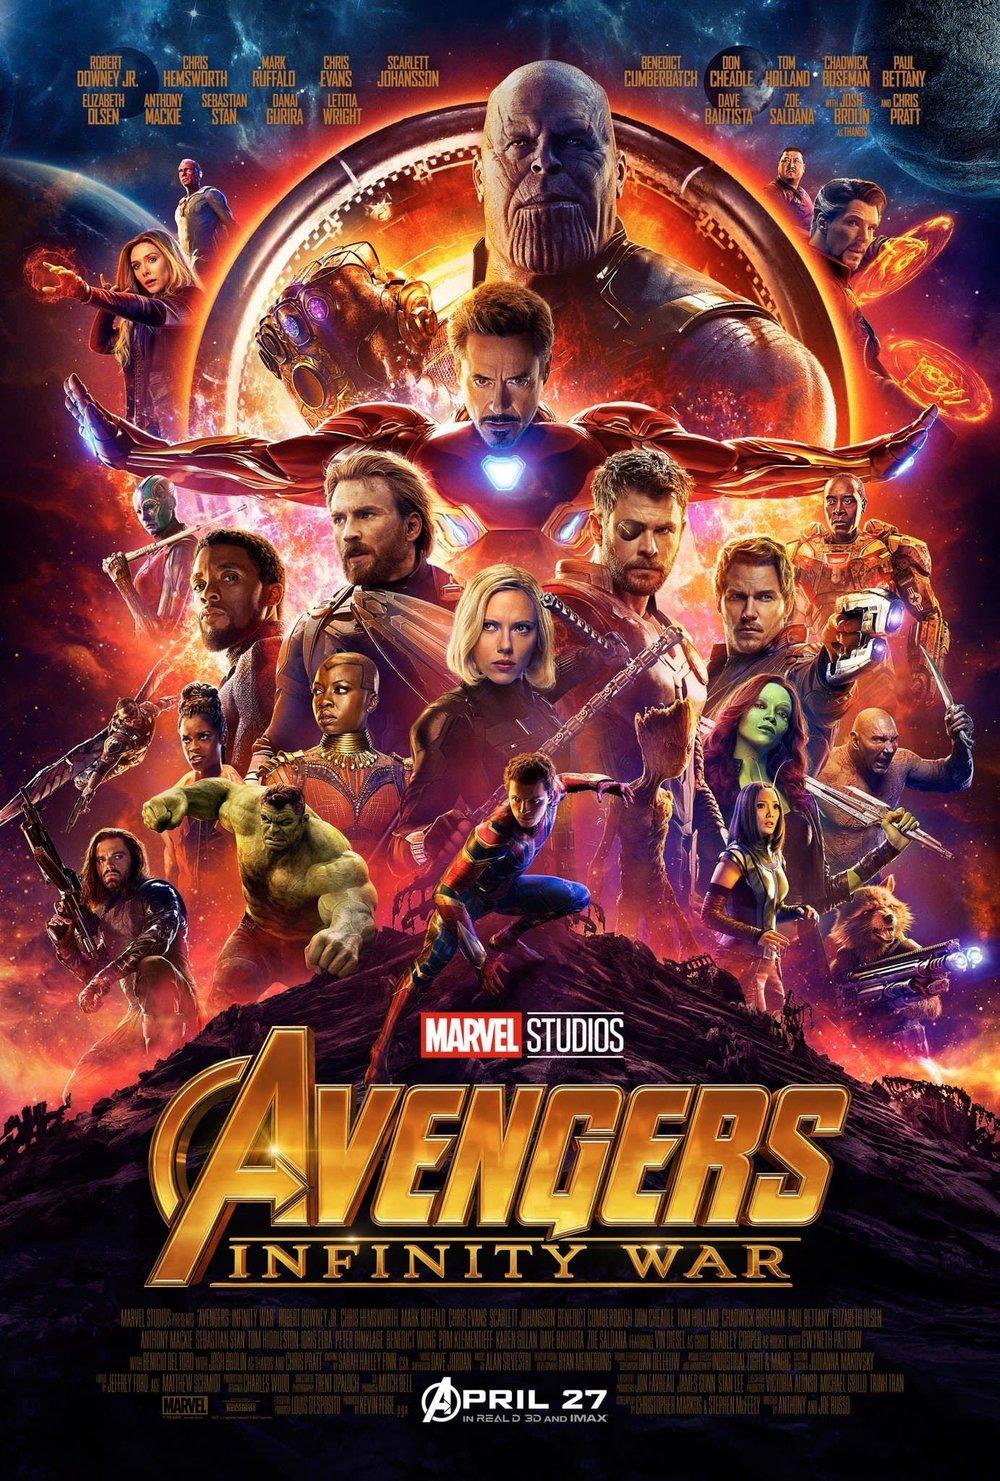 infinity-war-poster-new.jpg